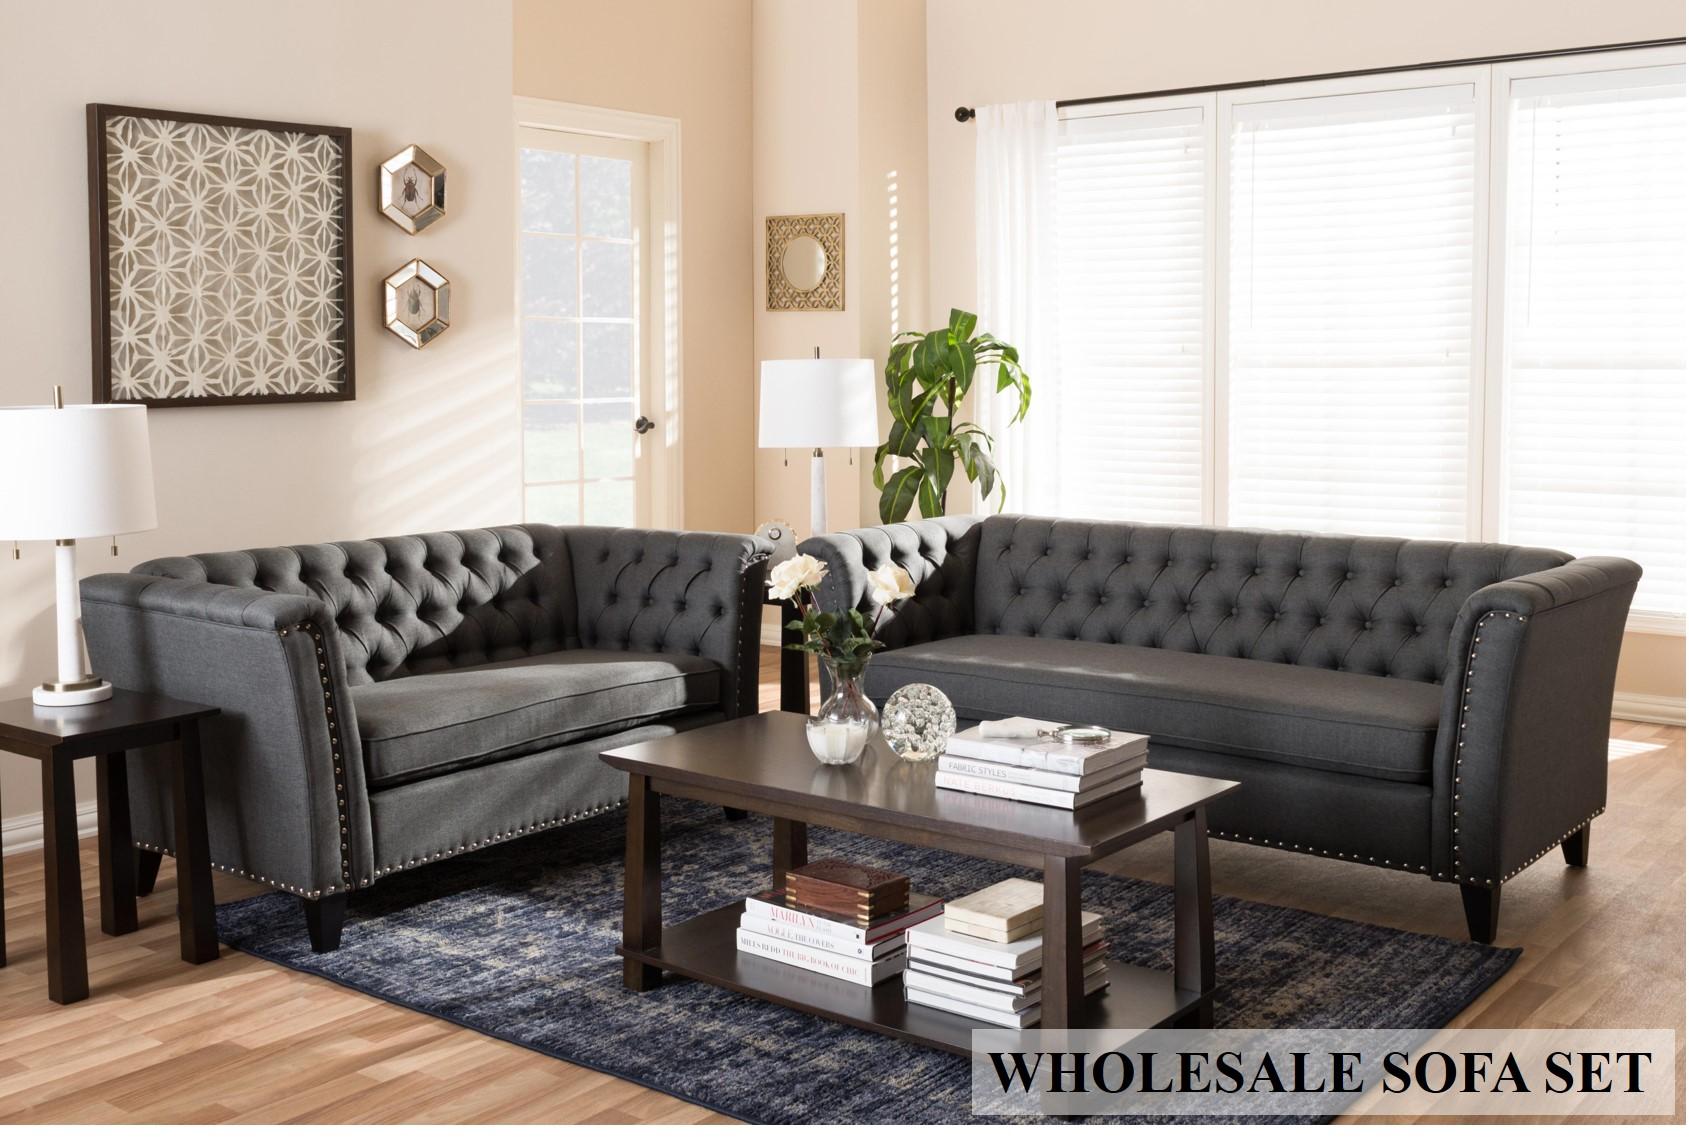 wholesale furniture | restaurant furniture | commercial furniture